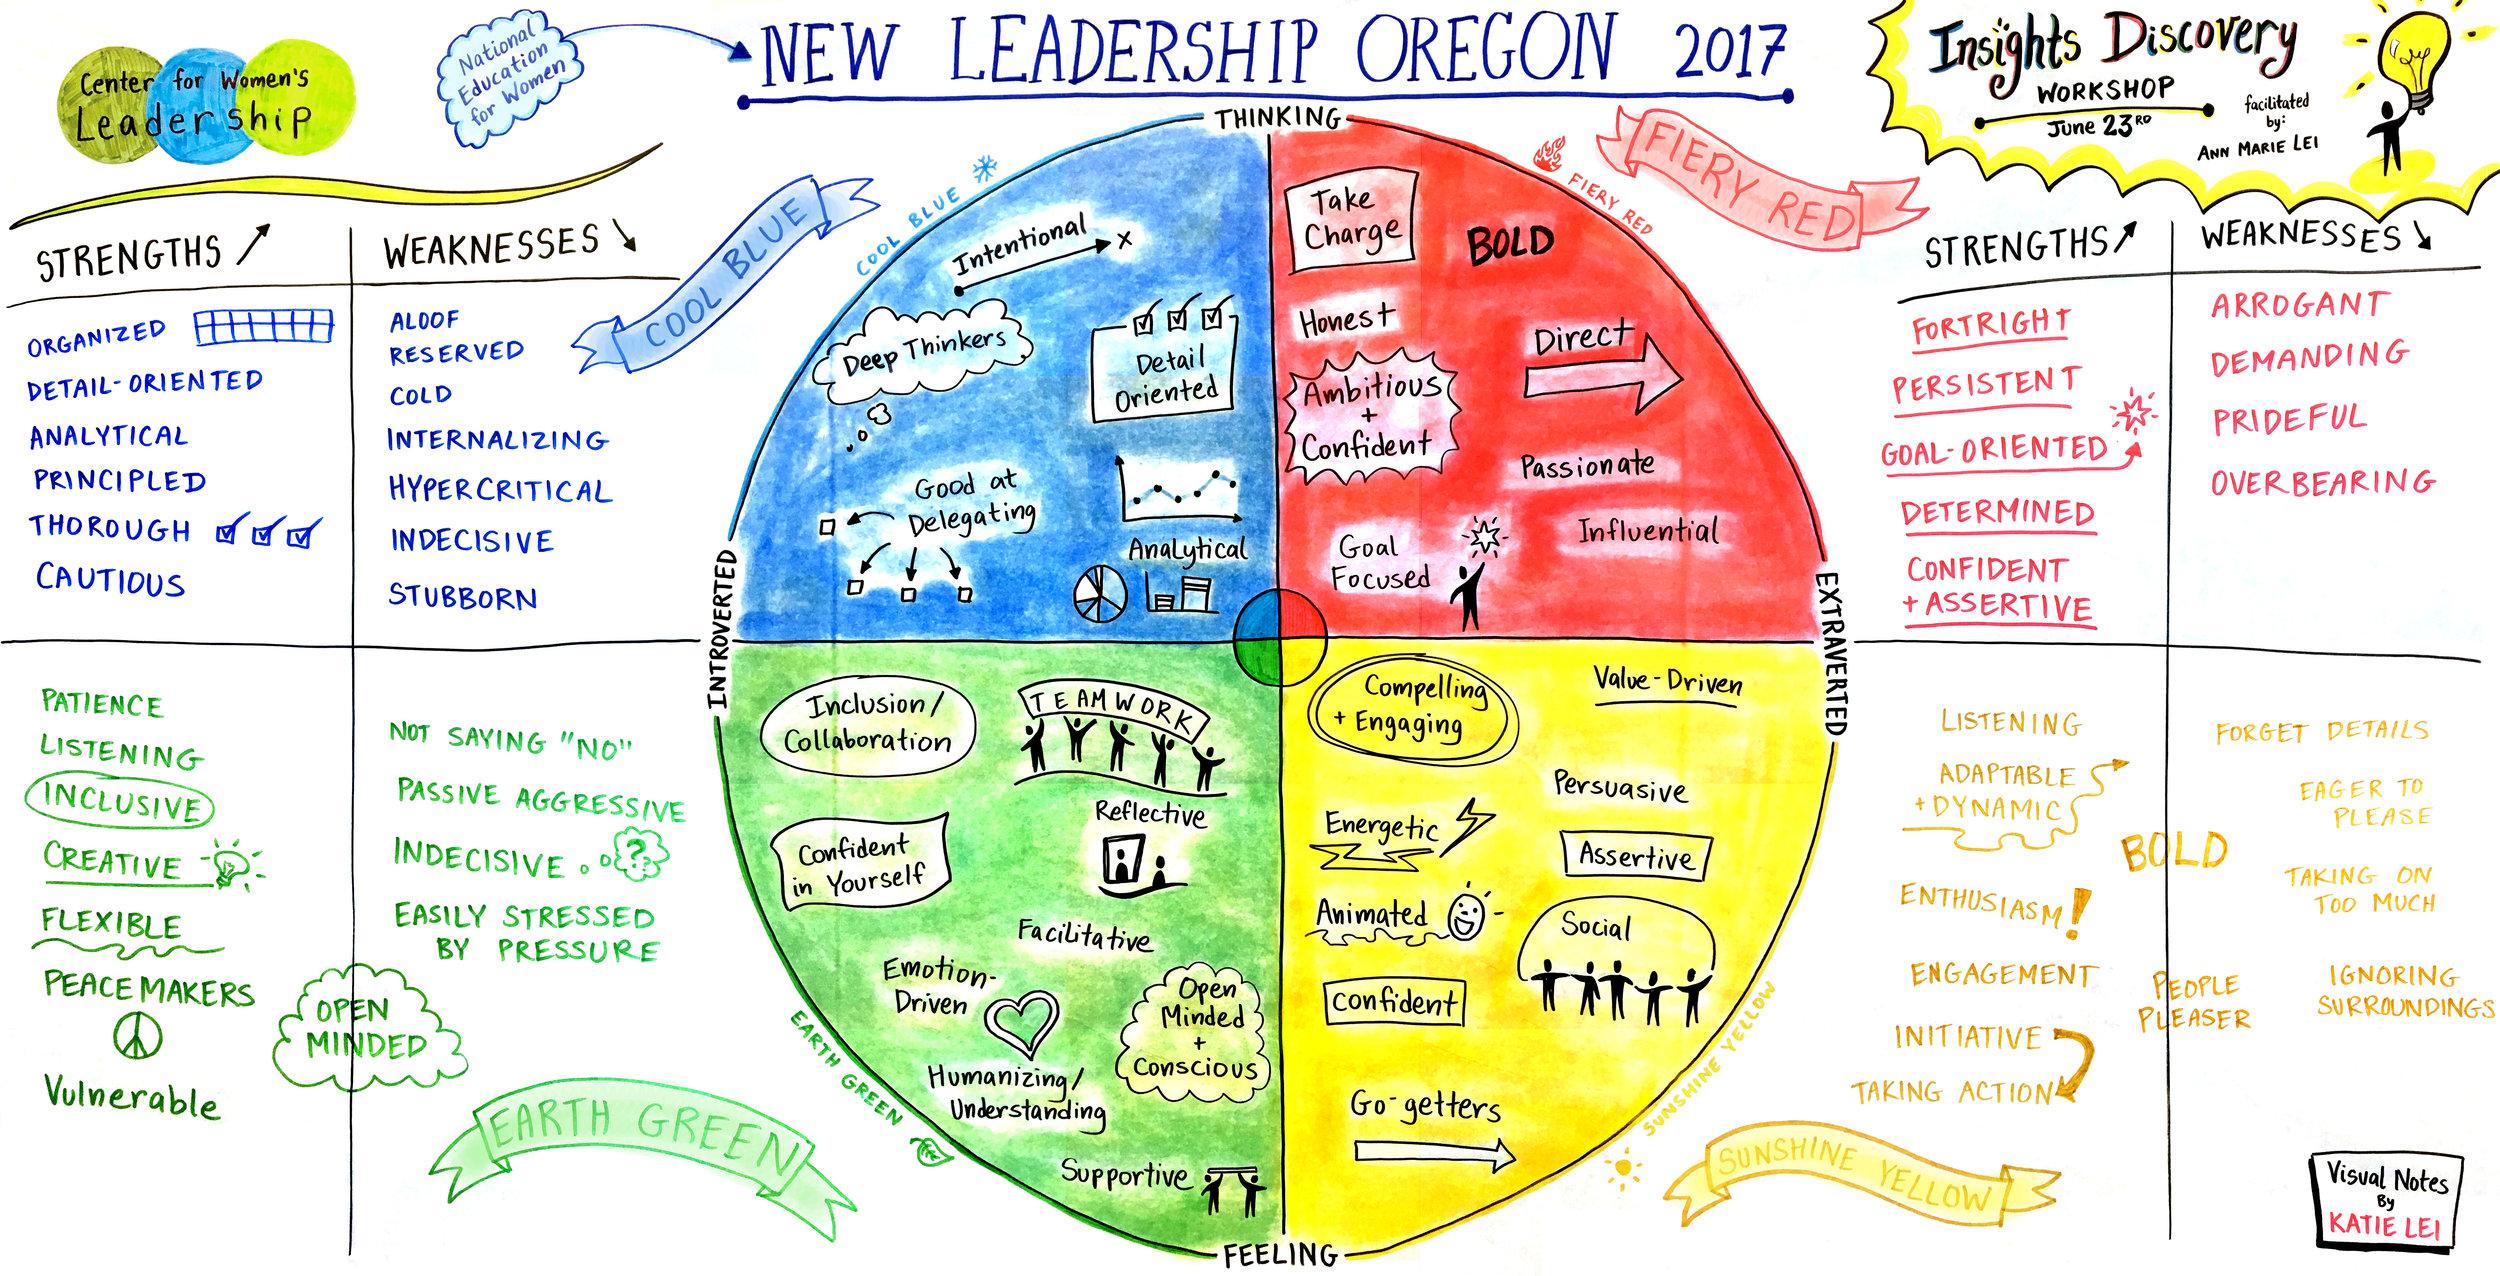 2017* NEW Leadership Oregon - Insights.jpg